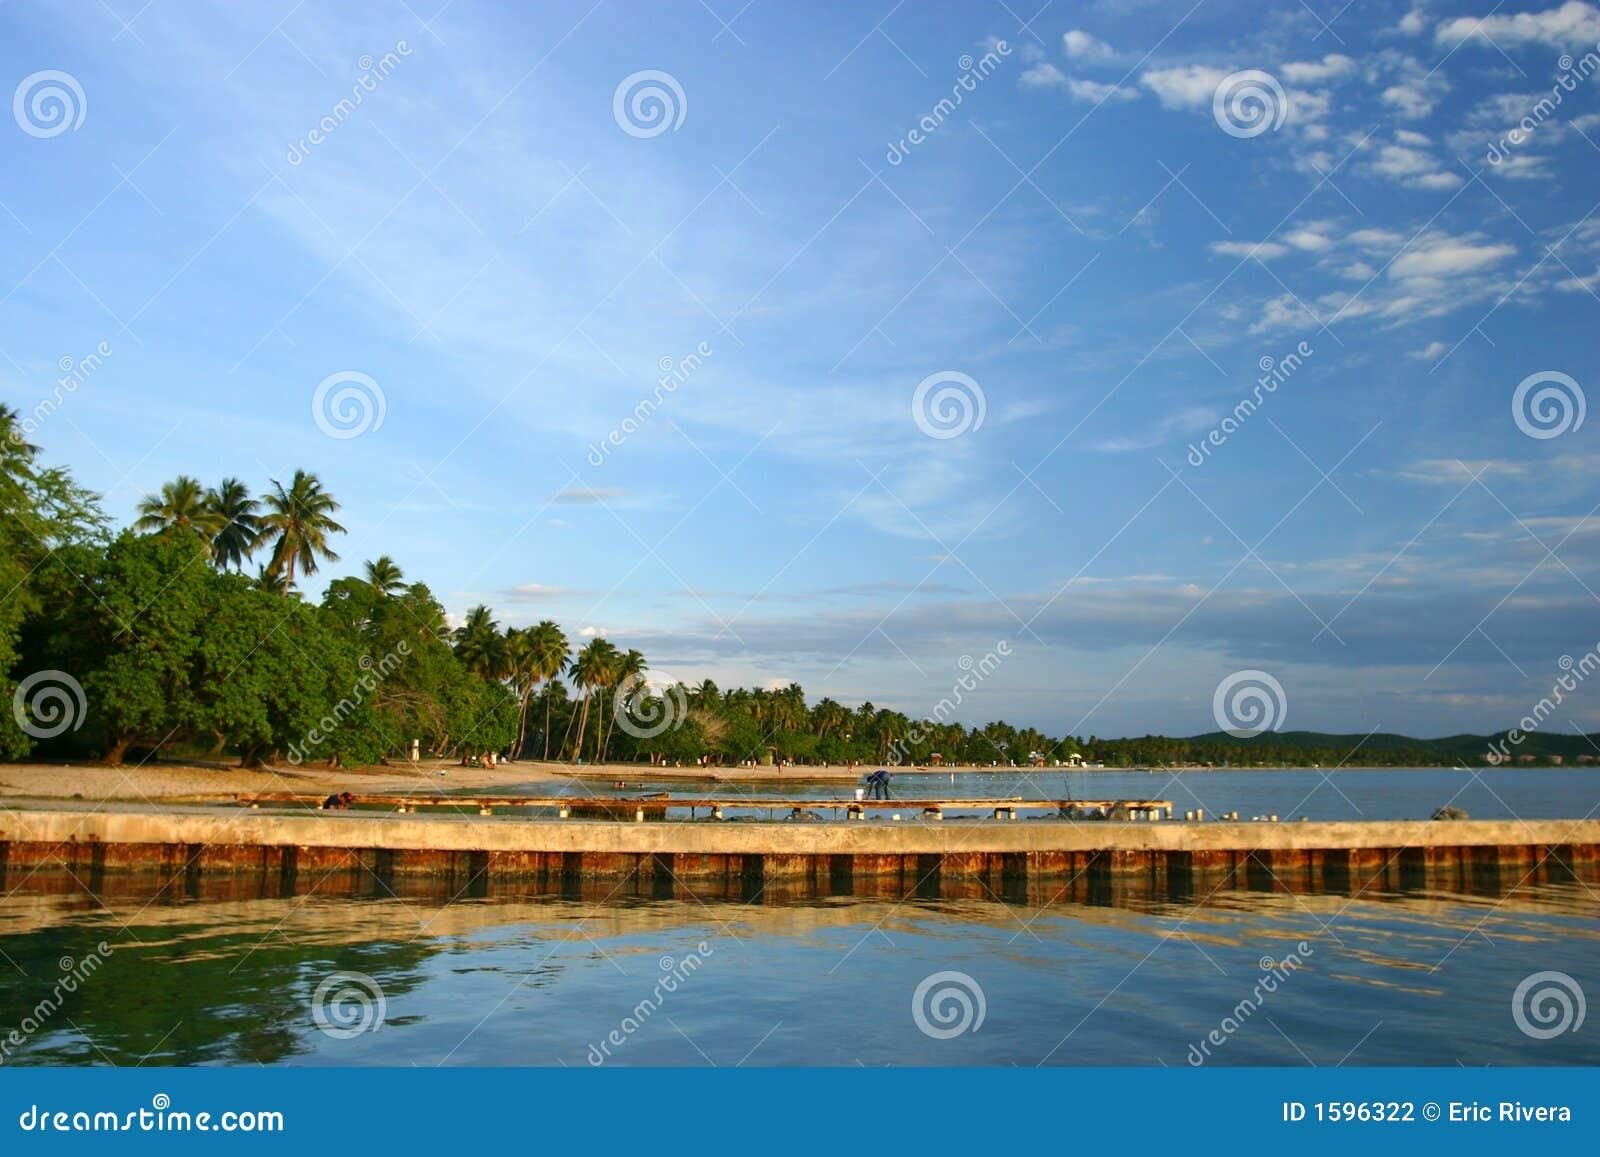 Boqueron Beach Pier At Puerto Rico Stock Photo Image Of